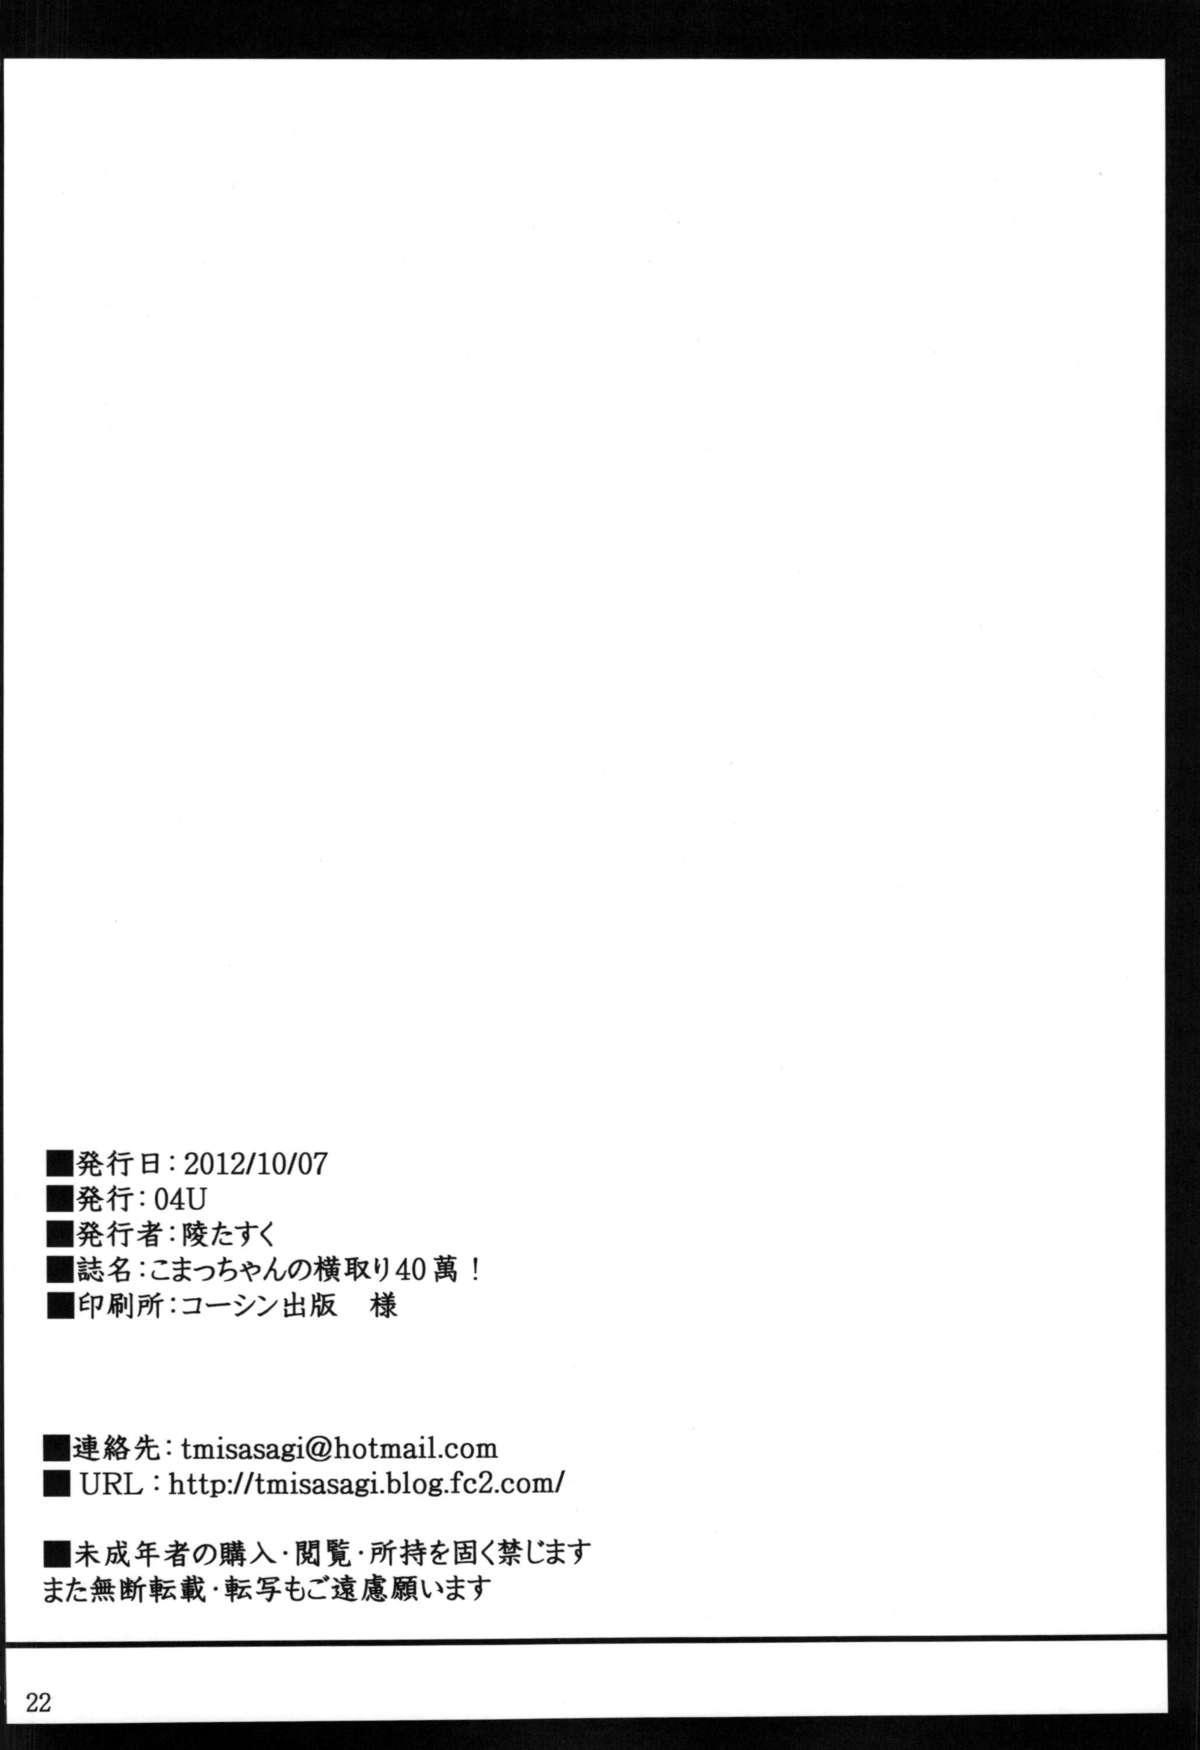 Komacchan no Yokodori 40-man! 20